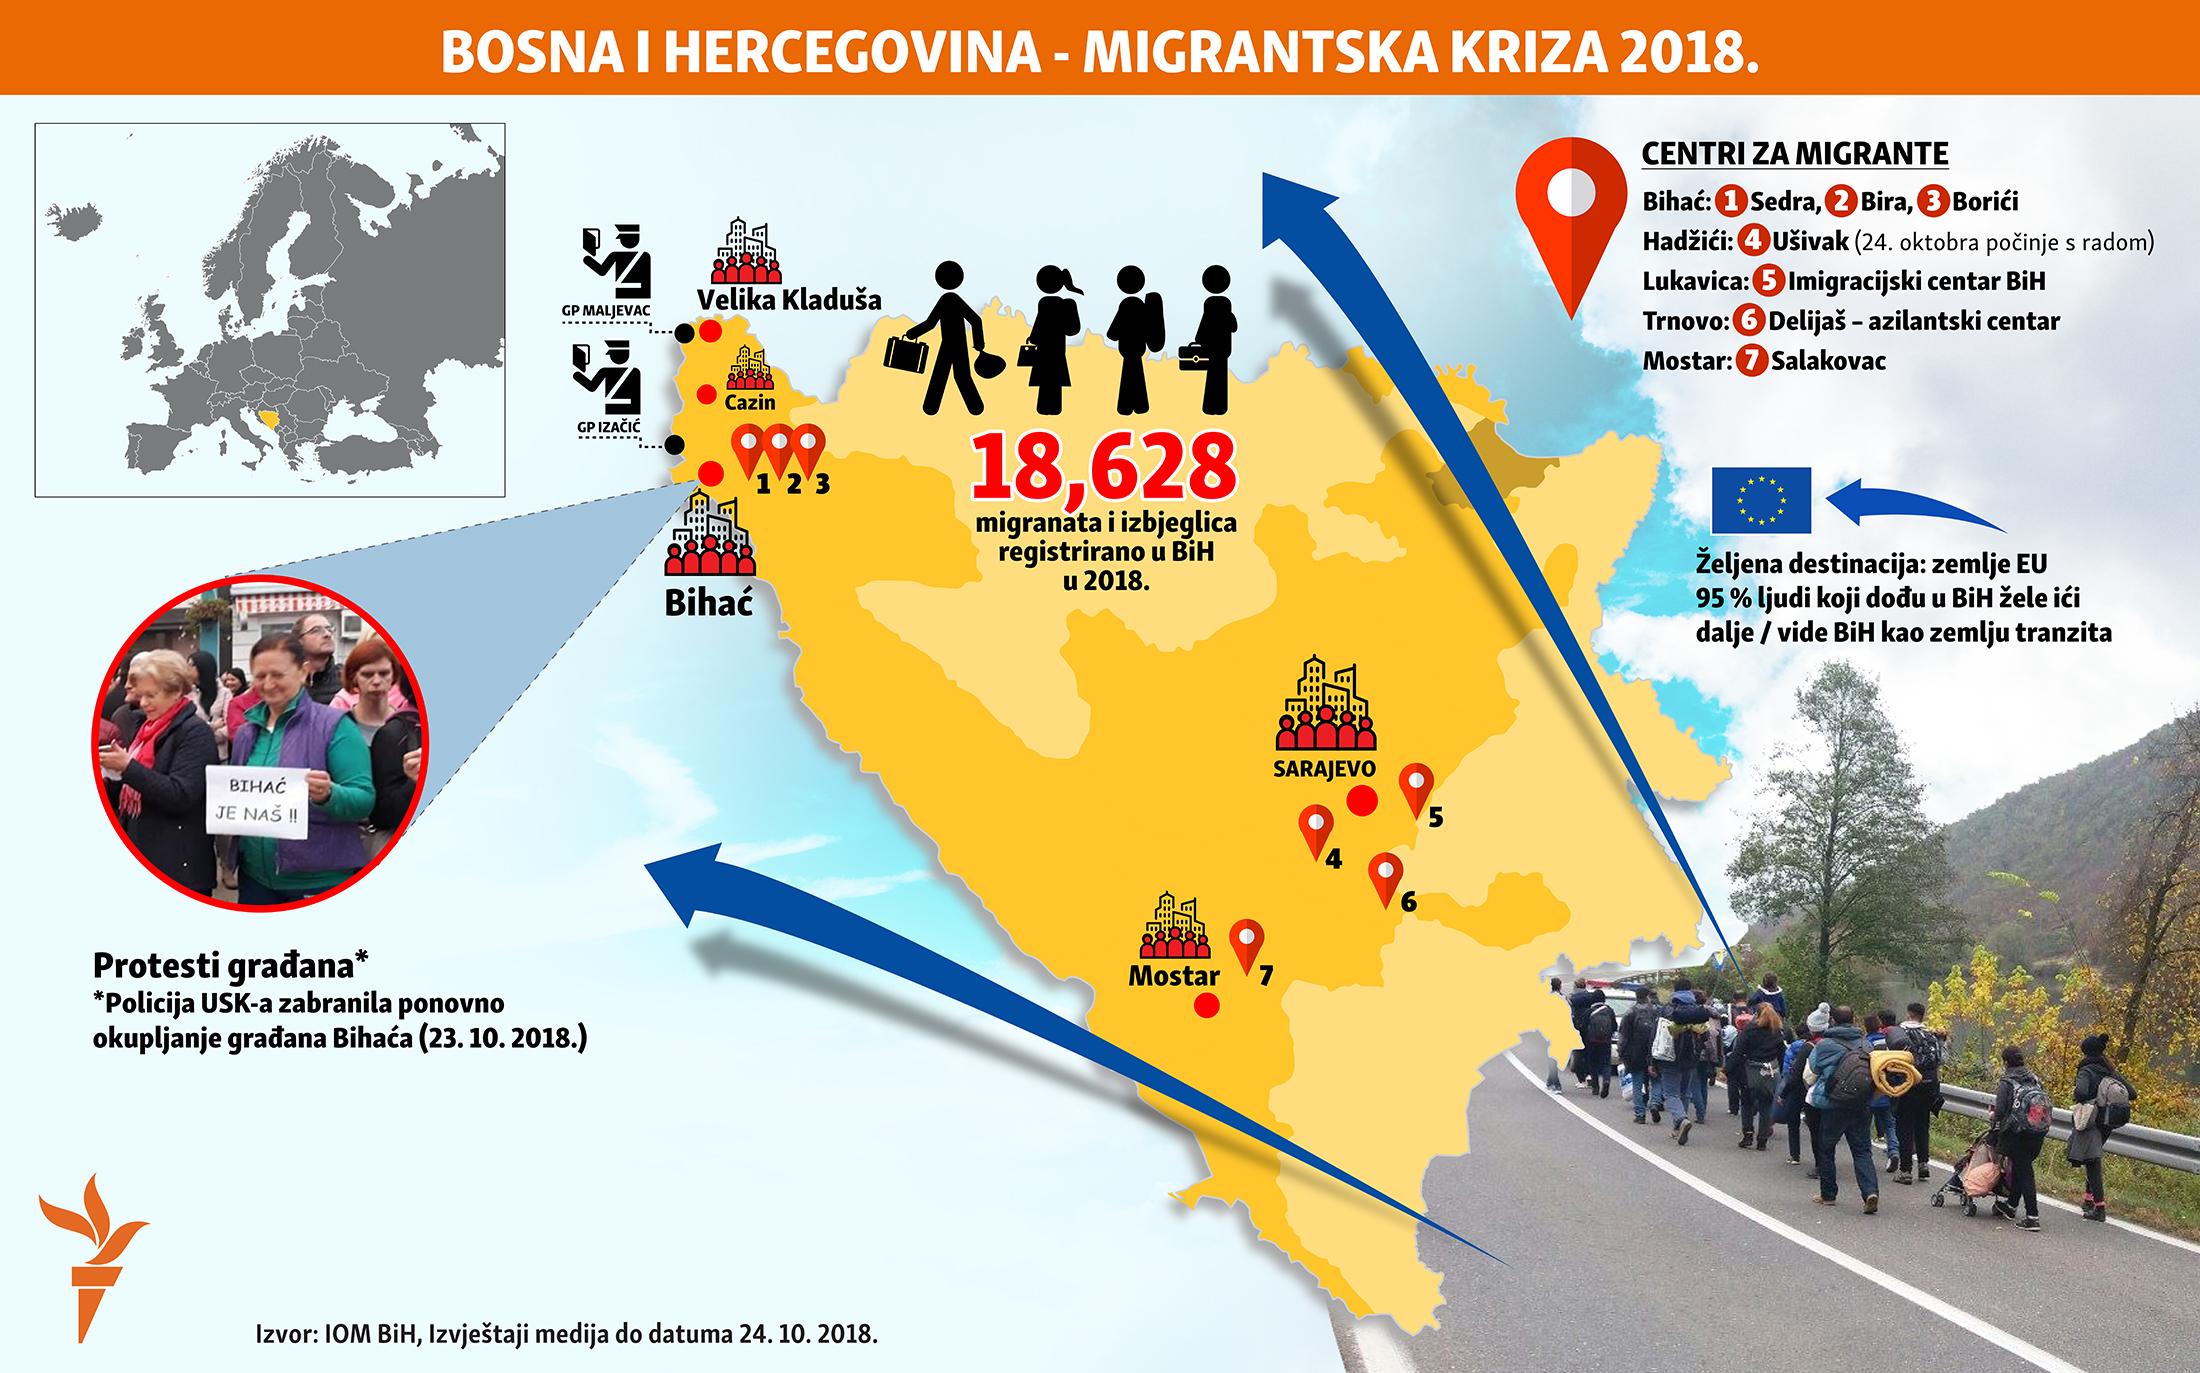 migrantska kriza u Bosni i Hercegovini, 2018